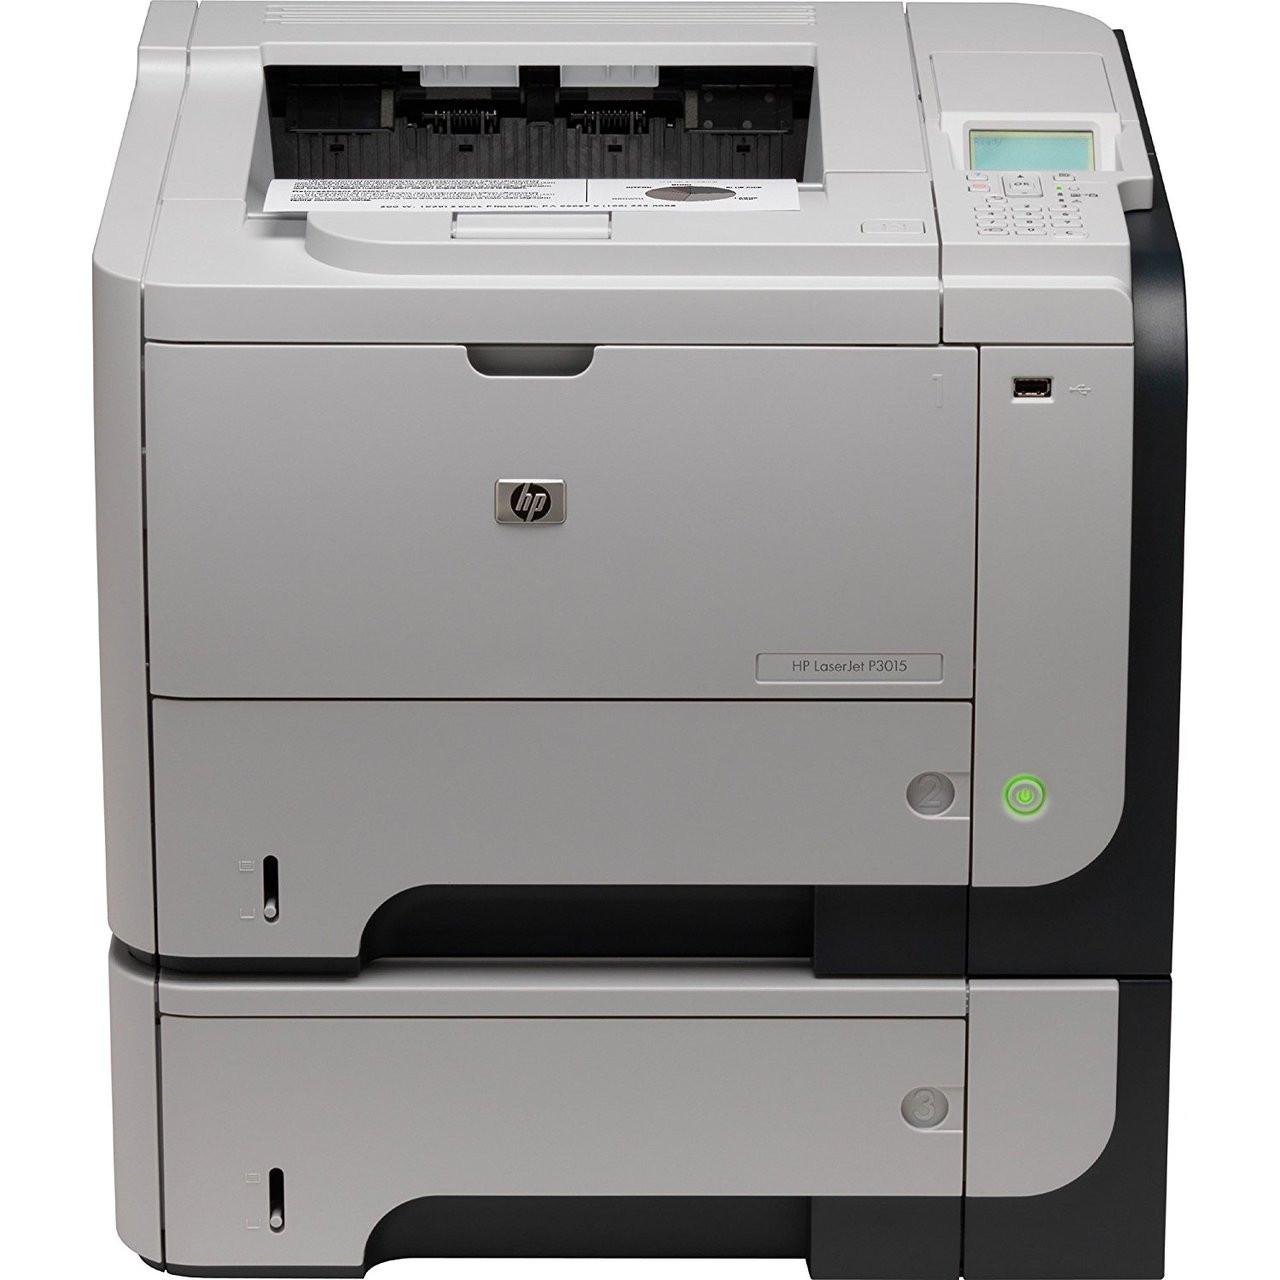 HP LaserJet P3015x - CE529A - HP Laser Printer for sale